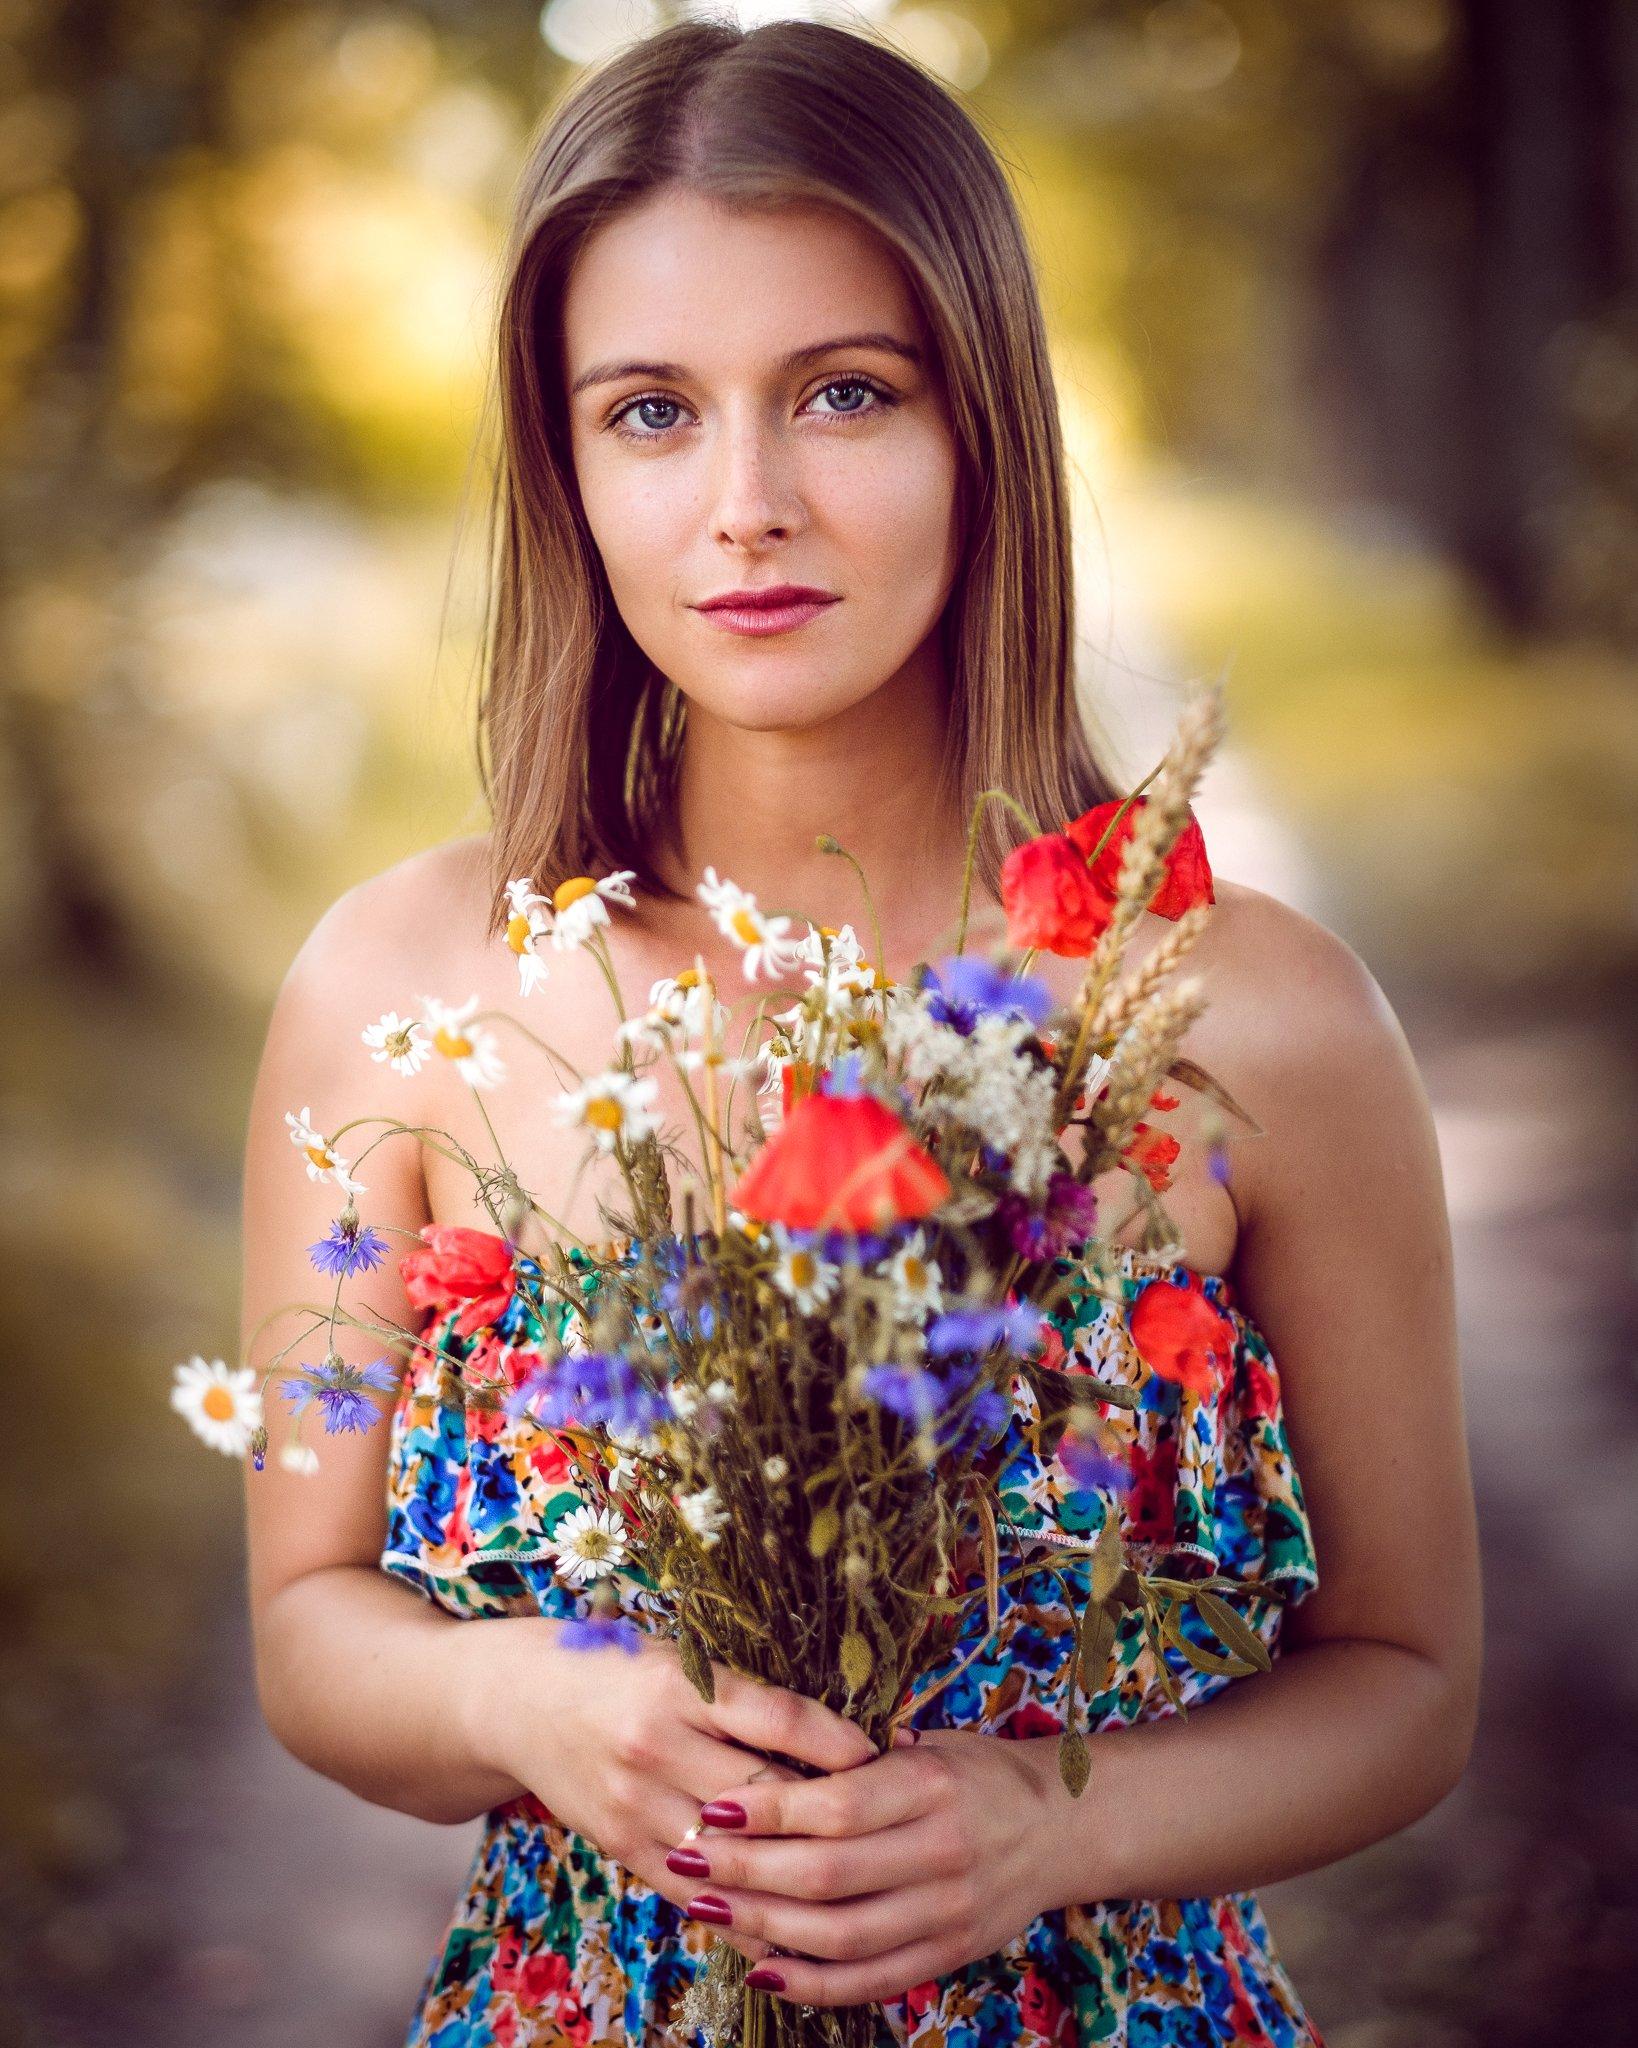 beauty, portrait, girl, young, female, flowers, Saulius Ke